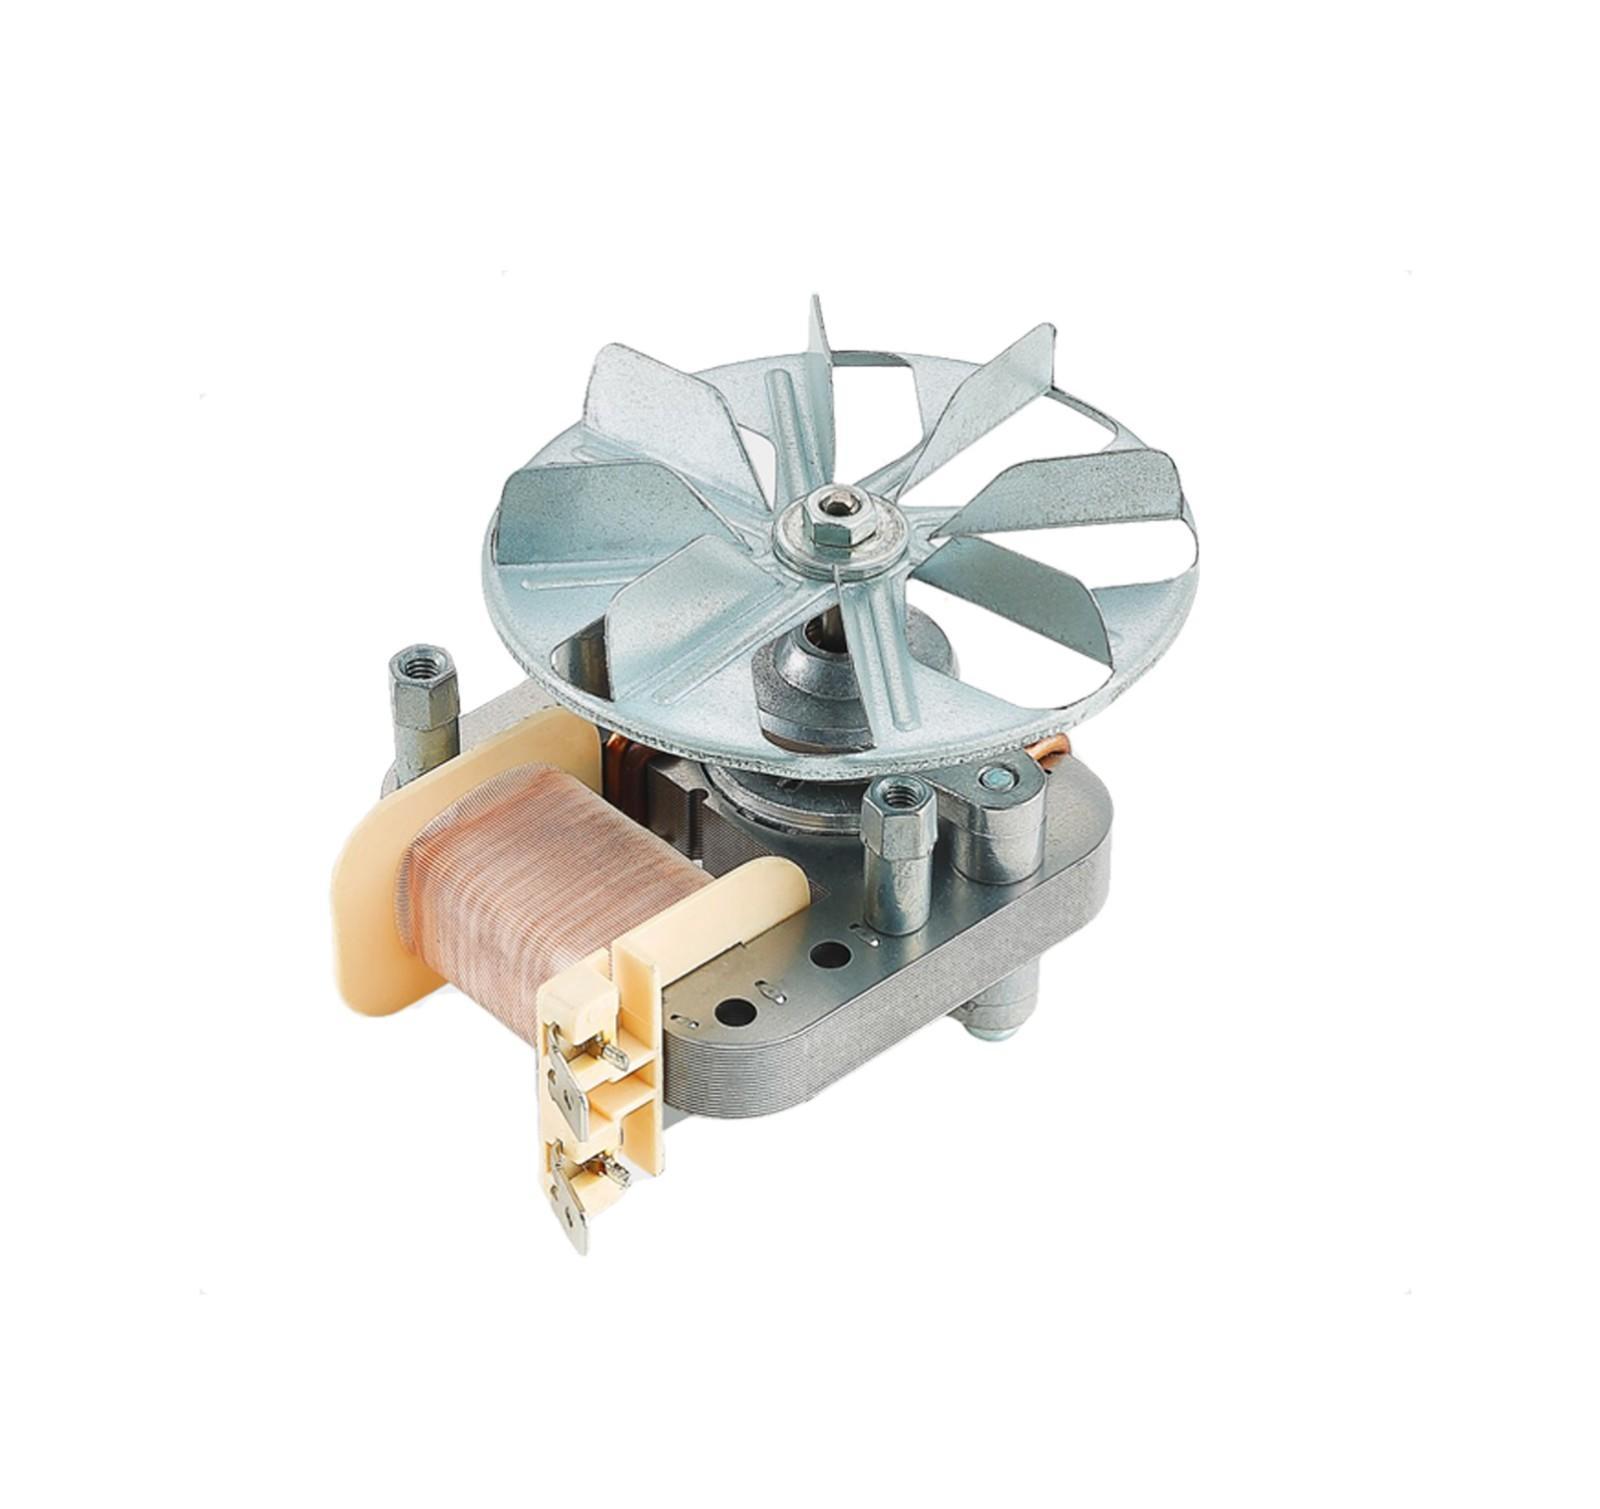 steel refrigerator small impeller shaded pole fan motor phase Zhuogao Brand